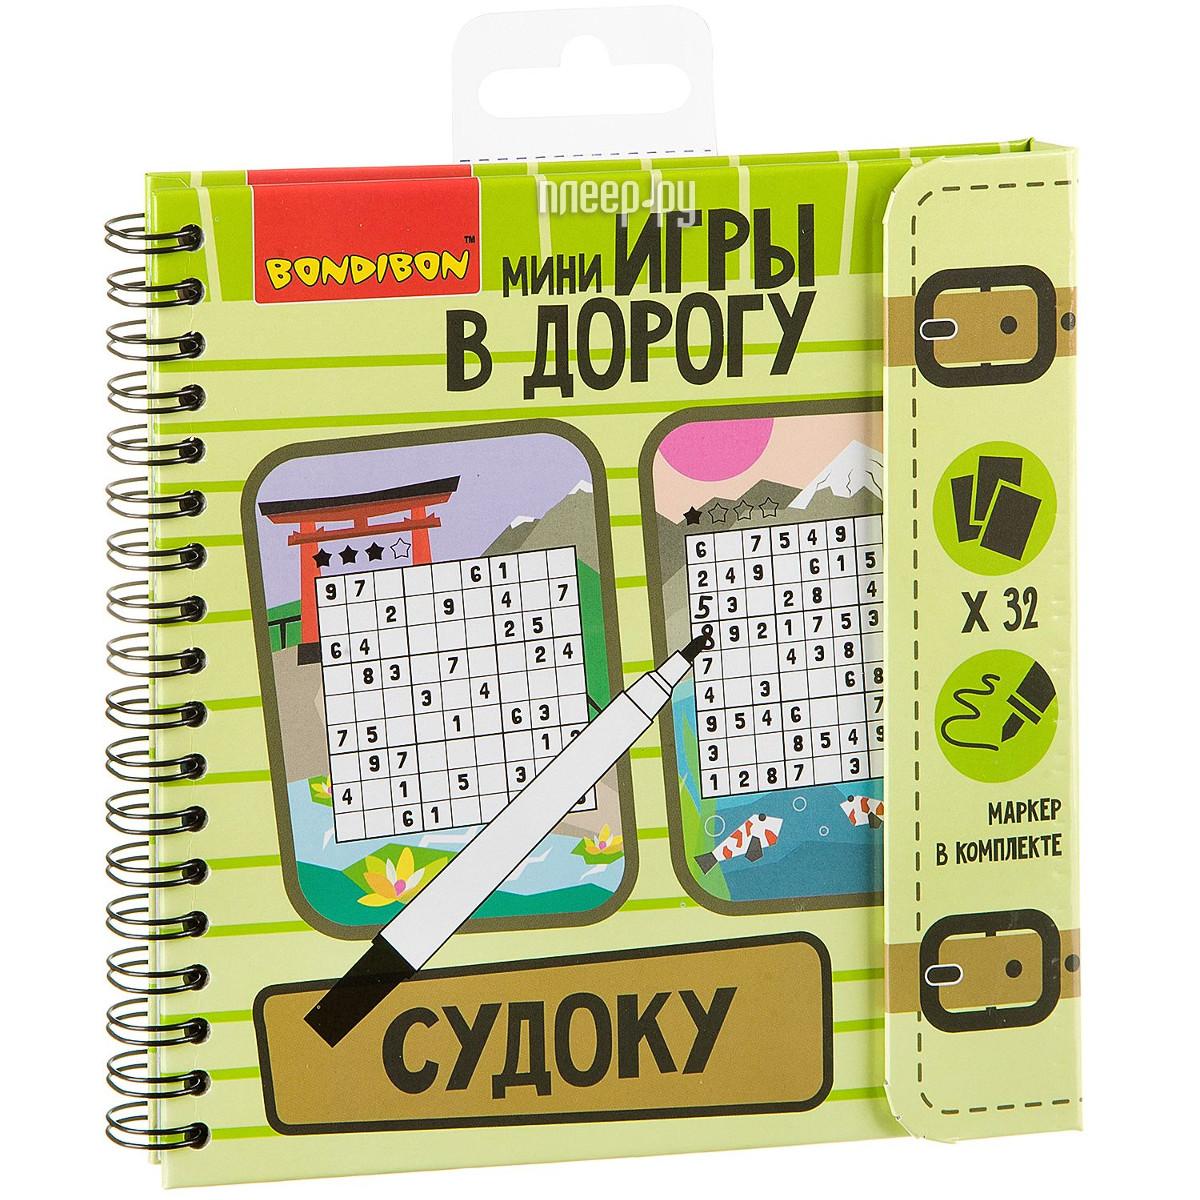 Головоломка Bondibon Судоку ВВ2131 за 165 рублей